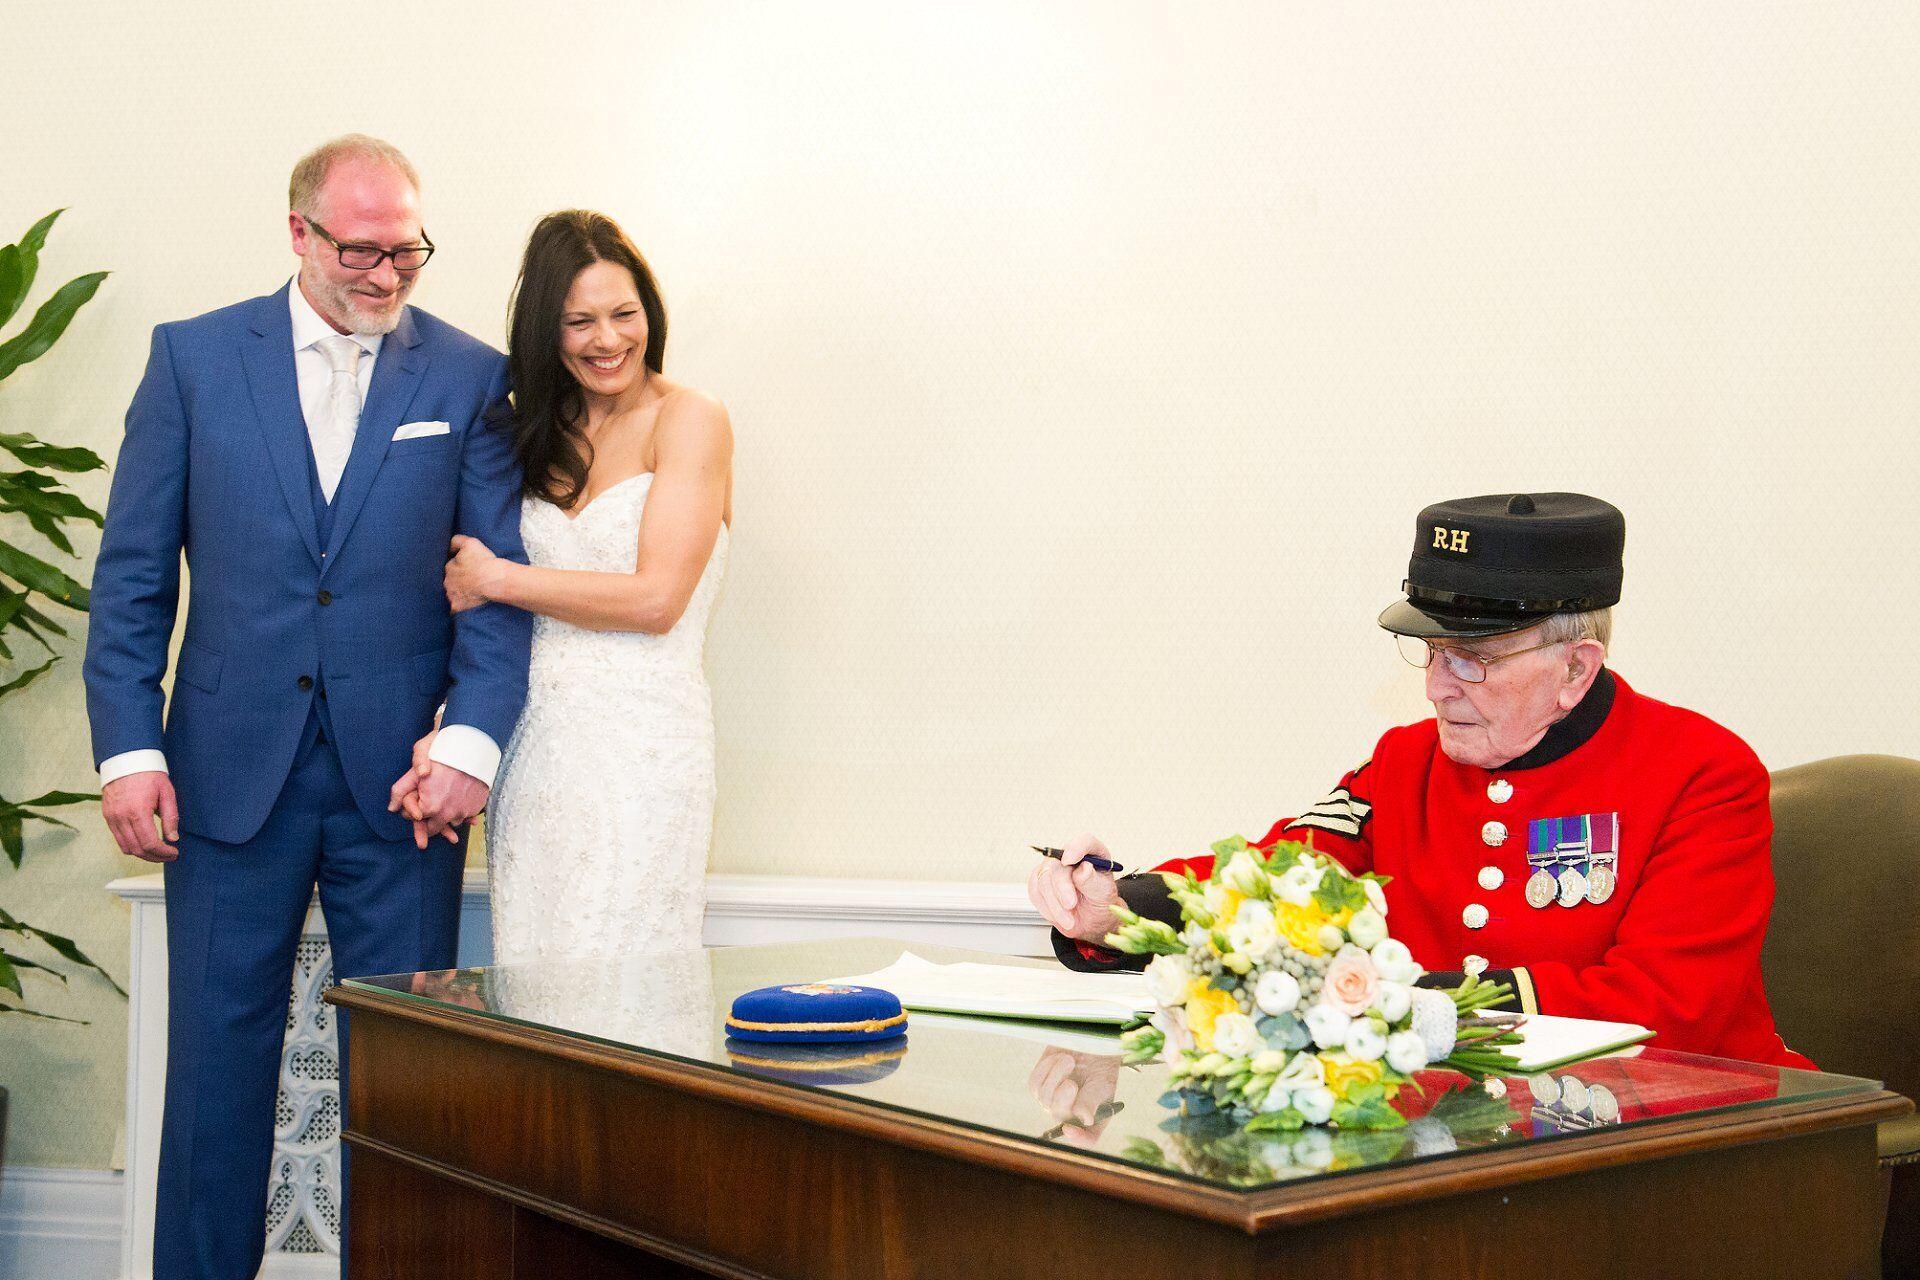 chelsea pensioners witness chelsea register office wedding in rossetti room